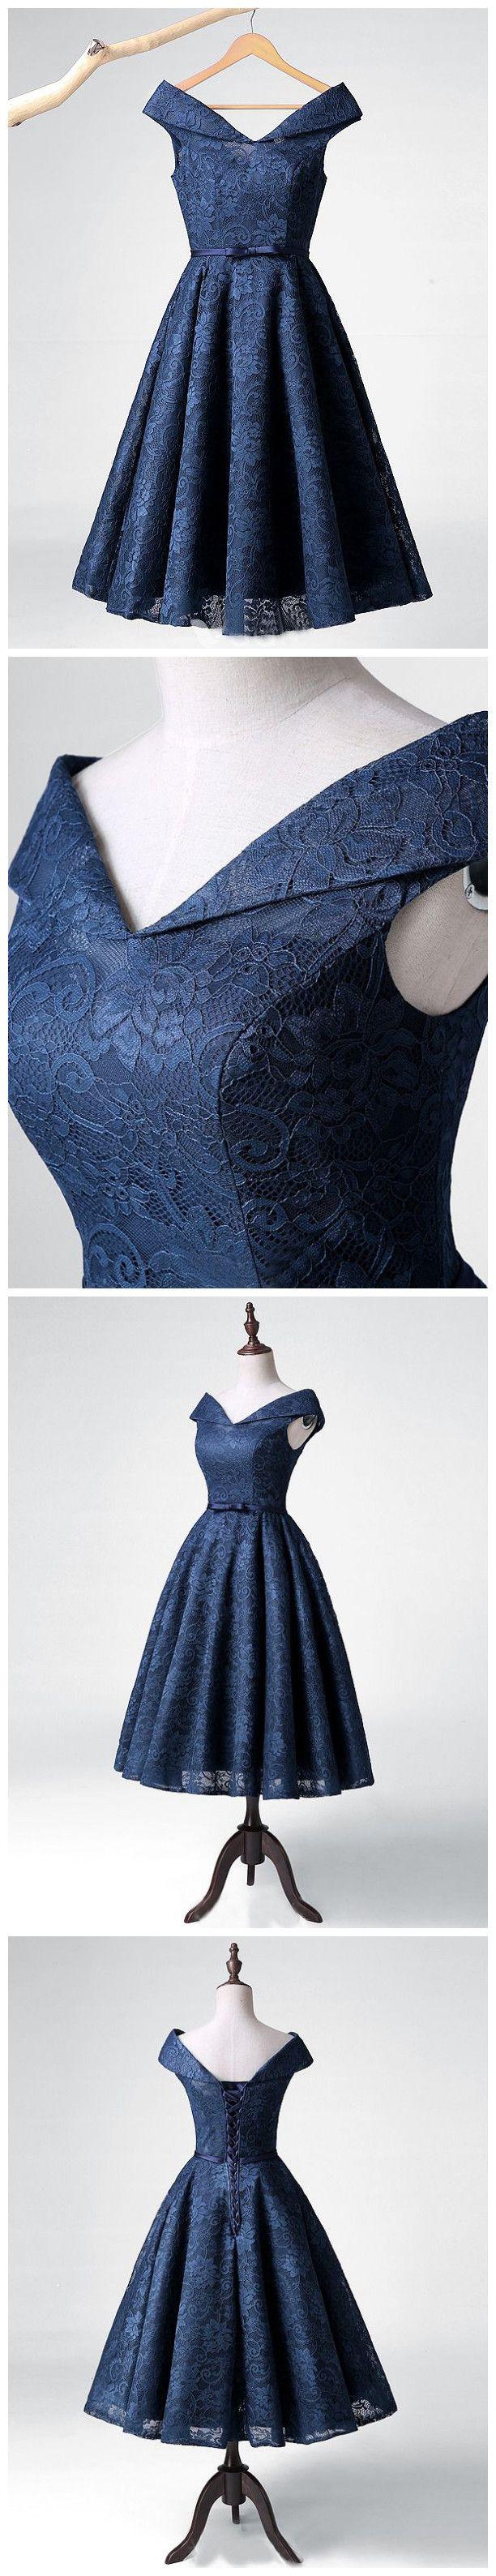 chic aline v neck lace homecoming dresses unique dark navy